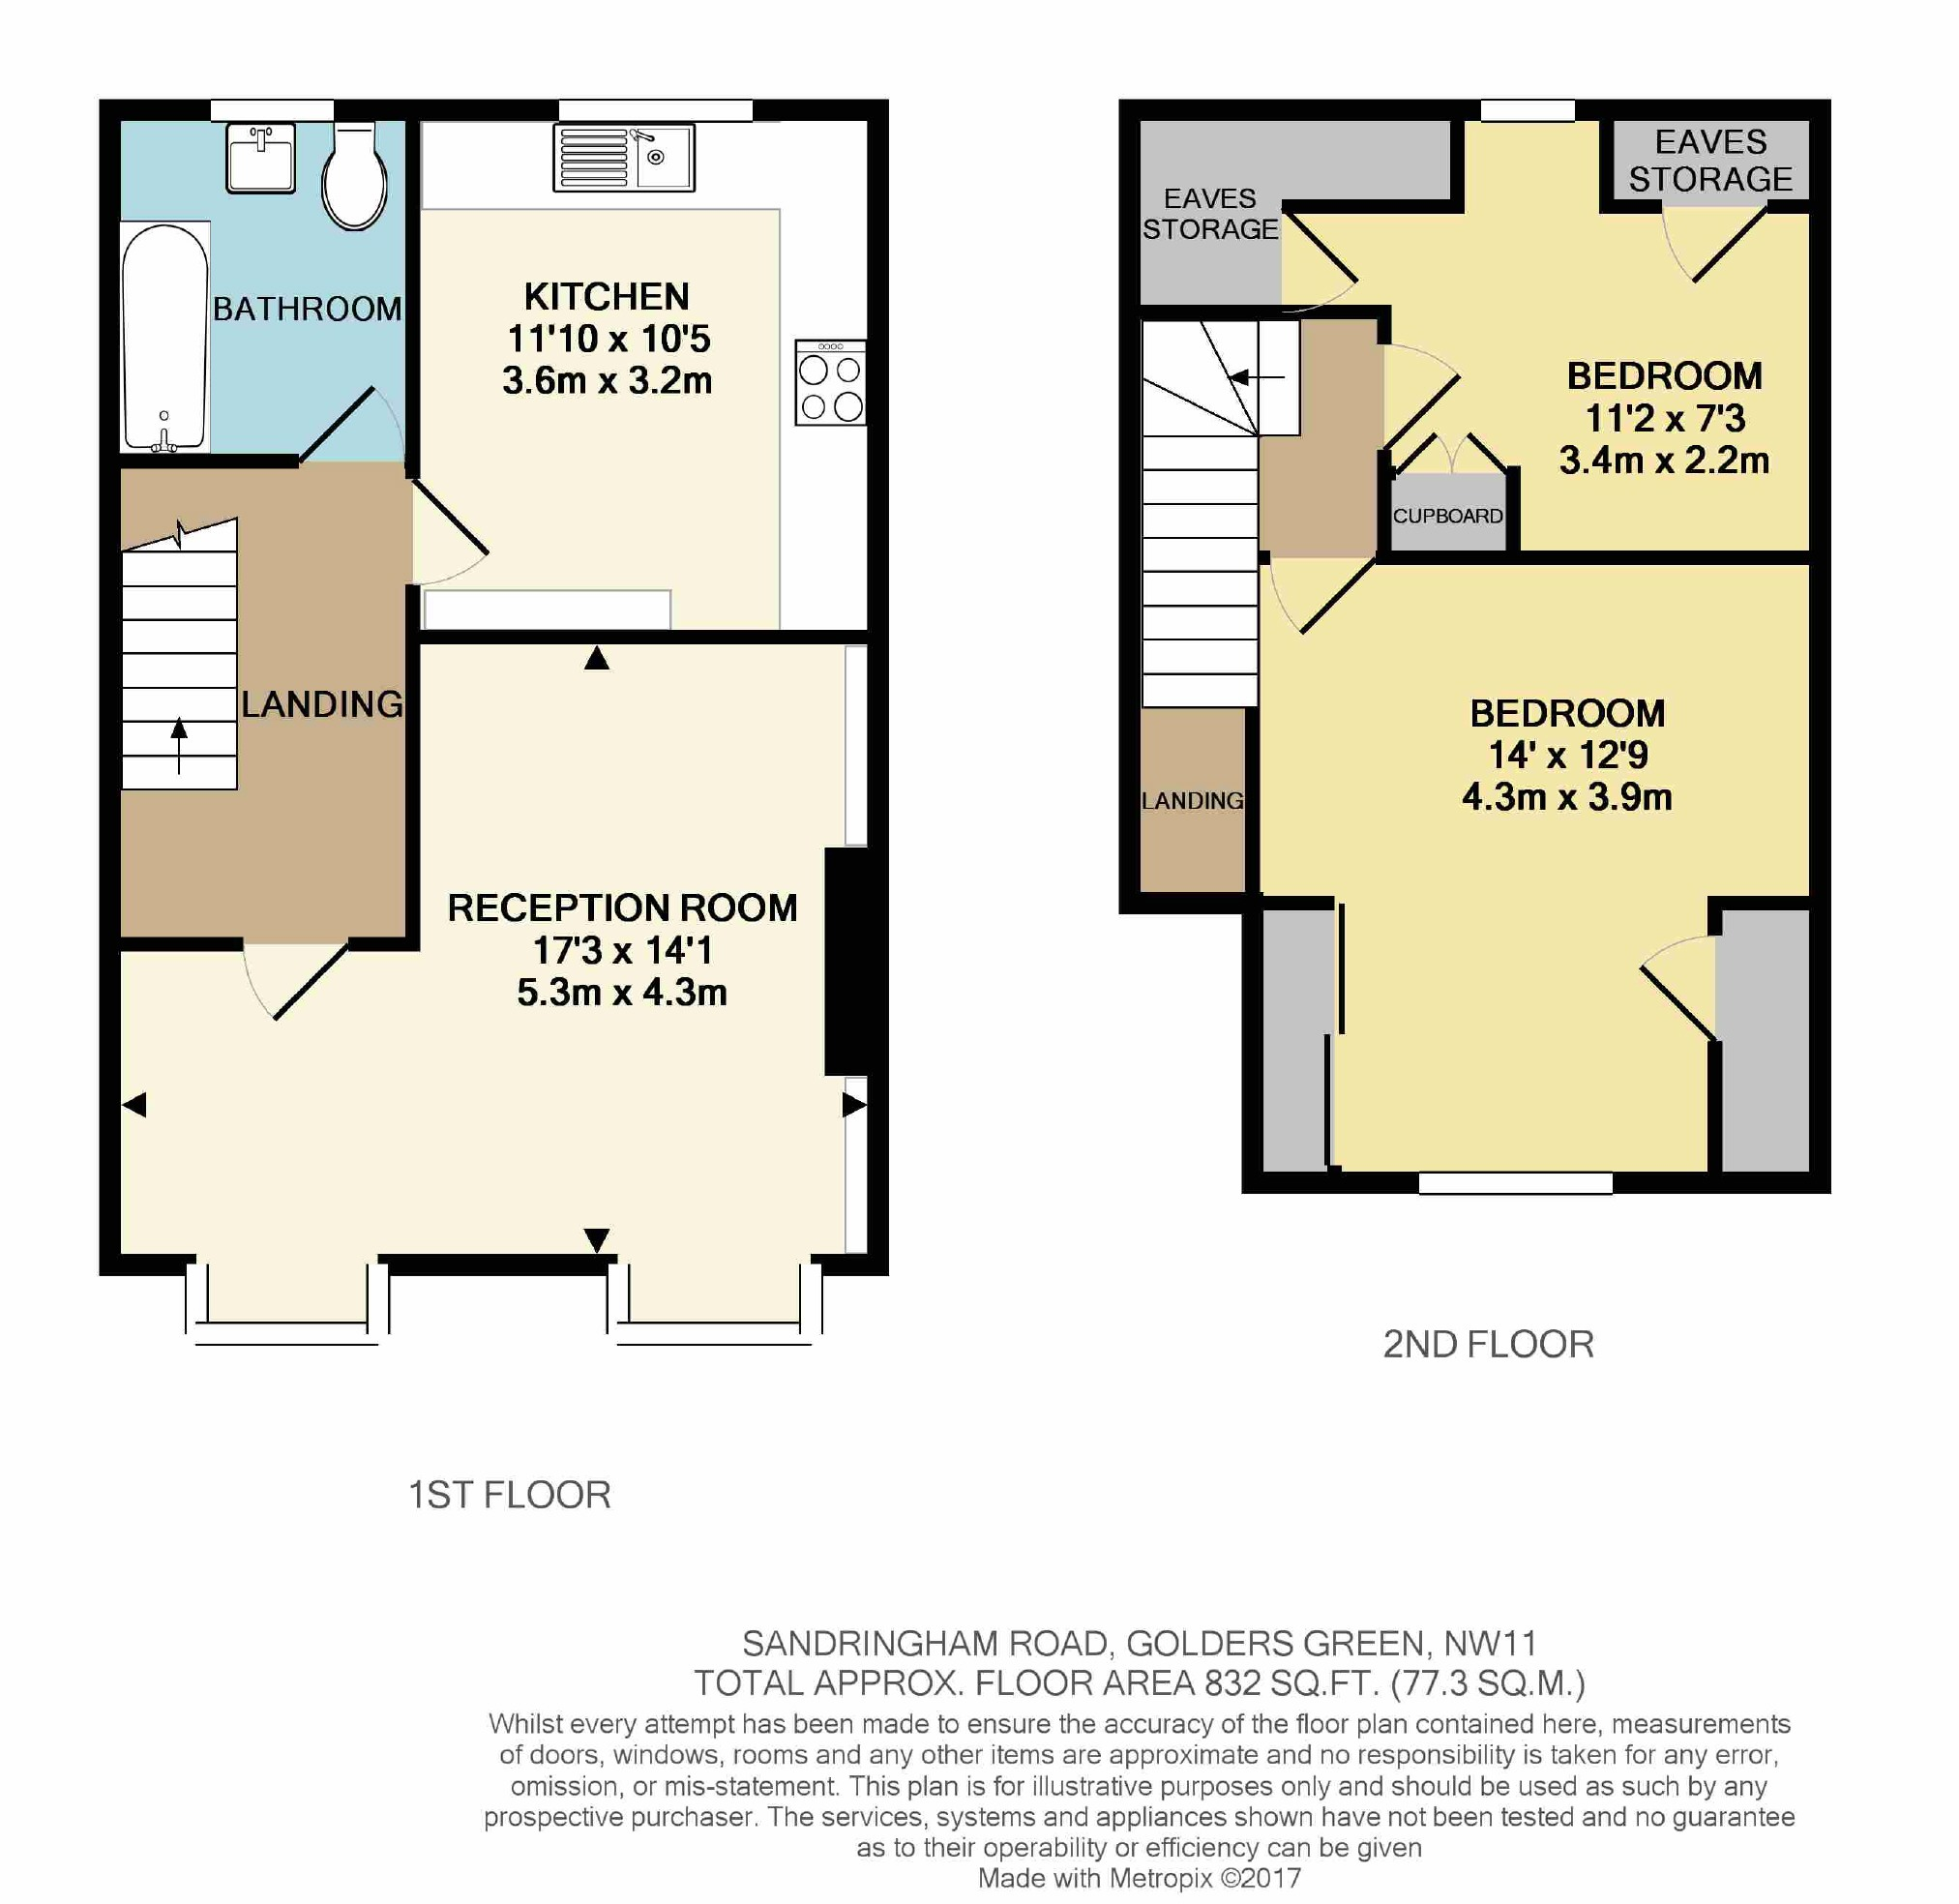 2 Bedroom Flat For Sale In Sandringham Road Golders Green Nw11 London